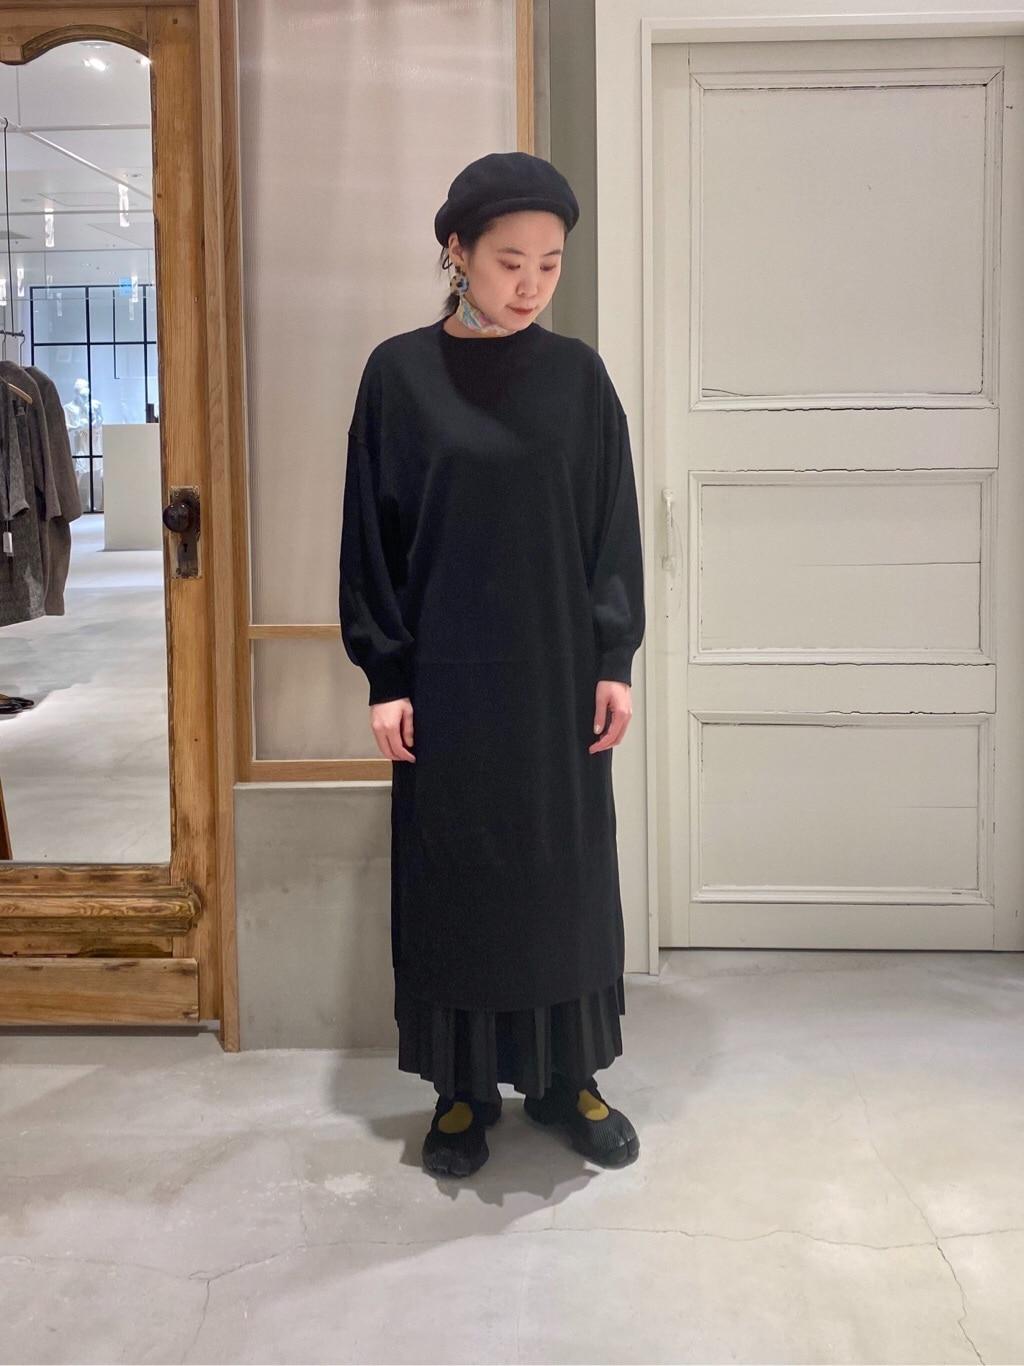 bulle de savon 渋谷スクランブルスクエア 身長:158cm 2021.01.05